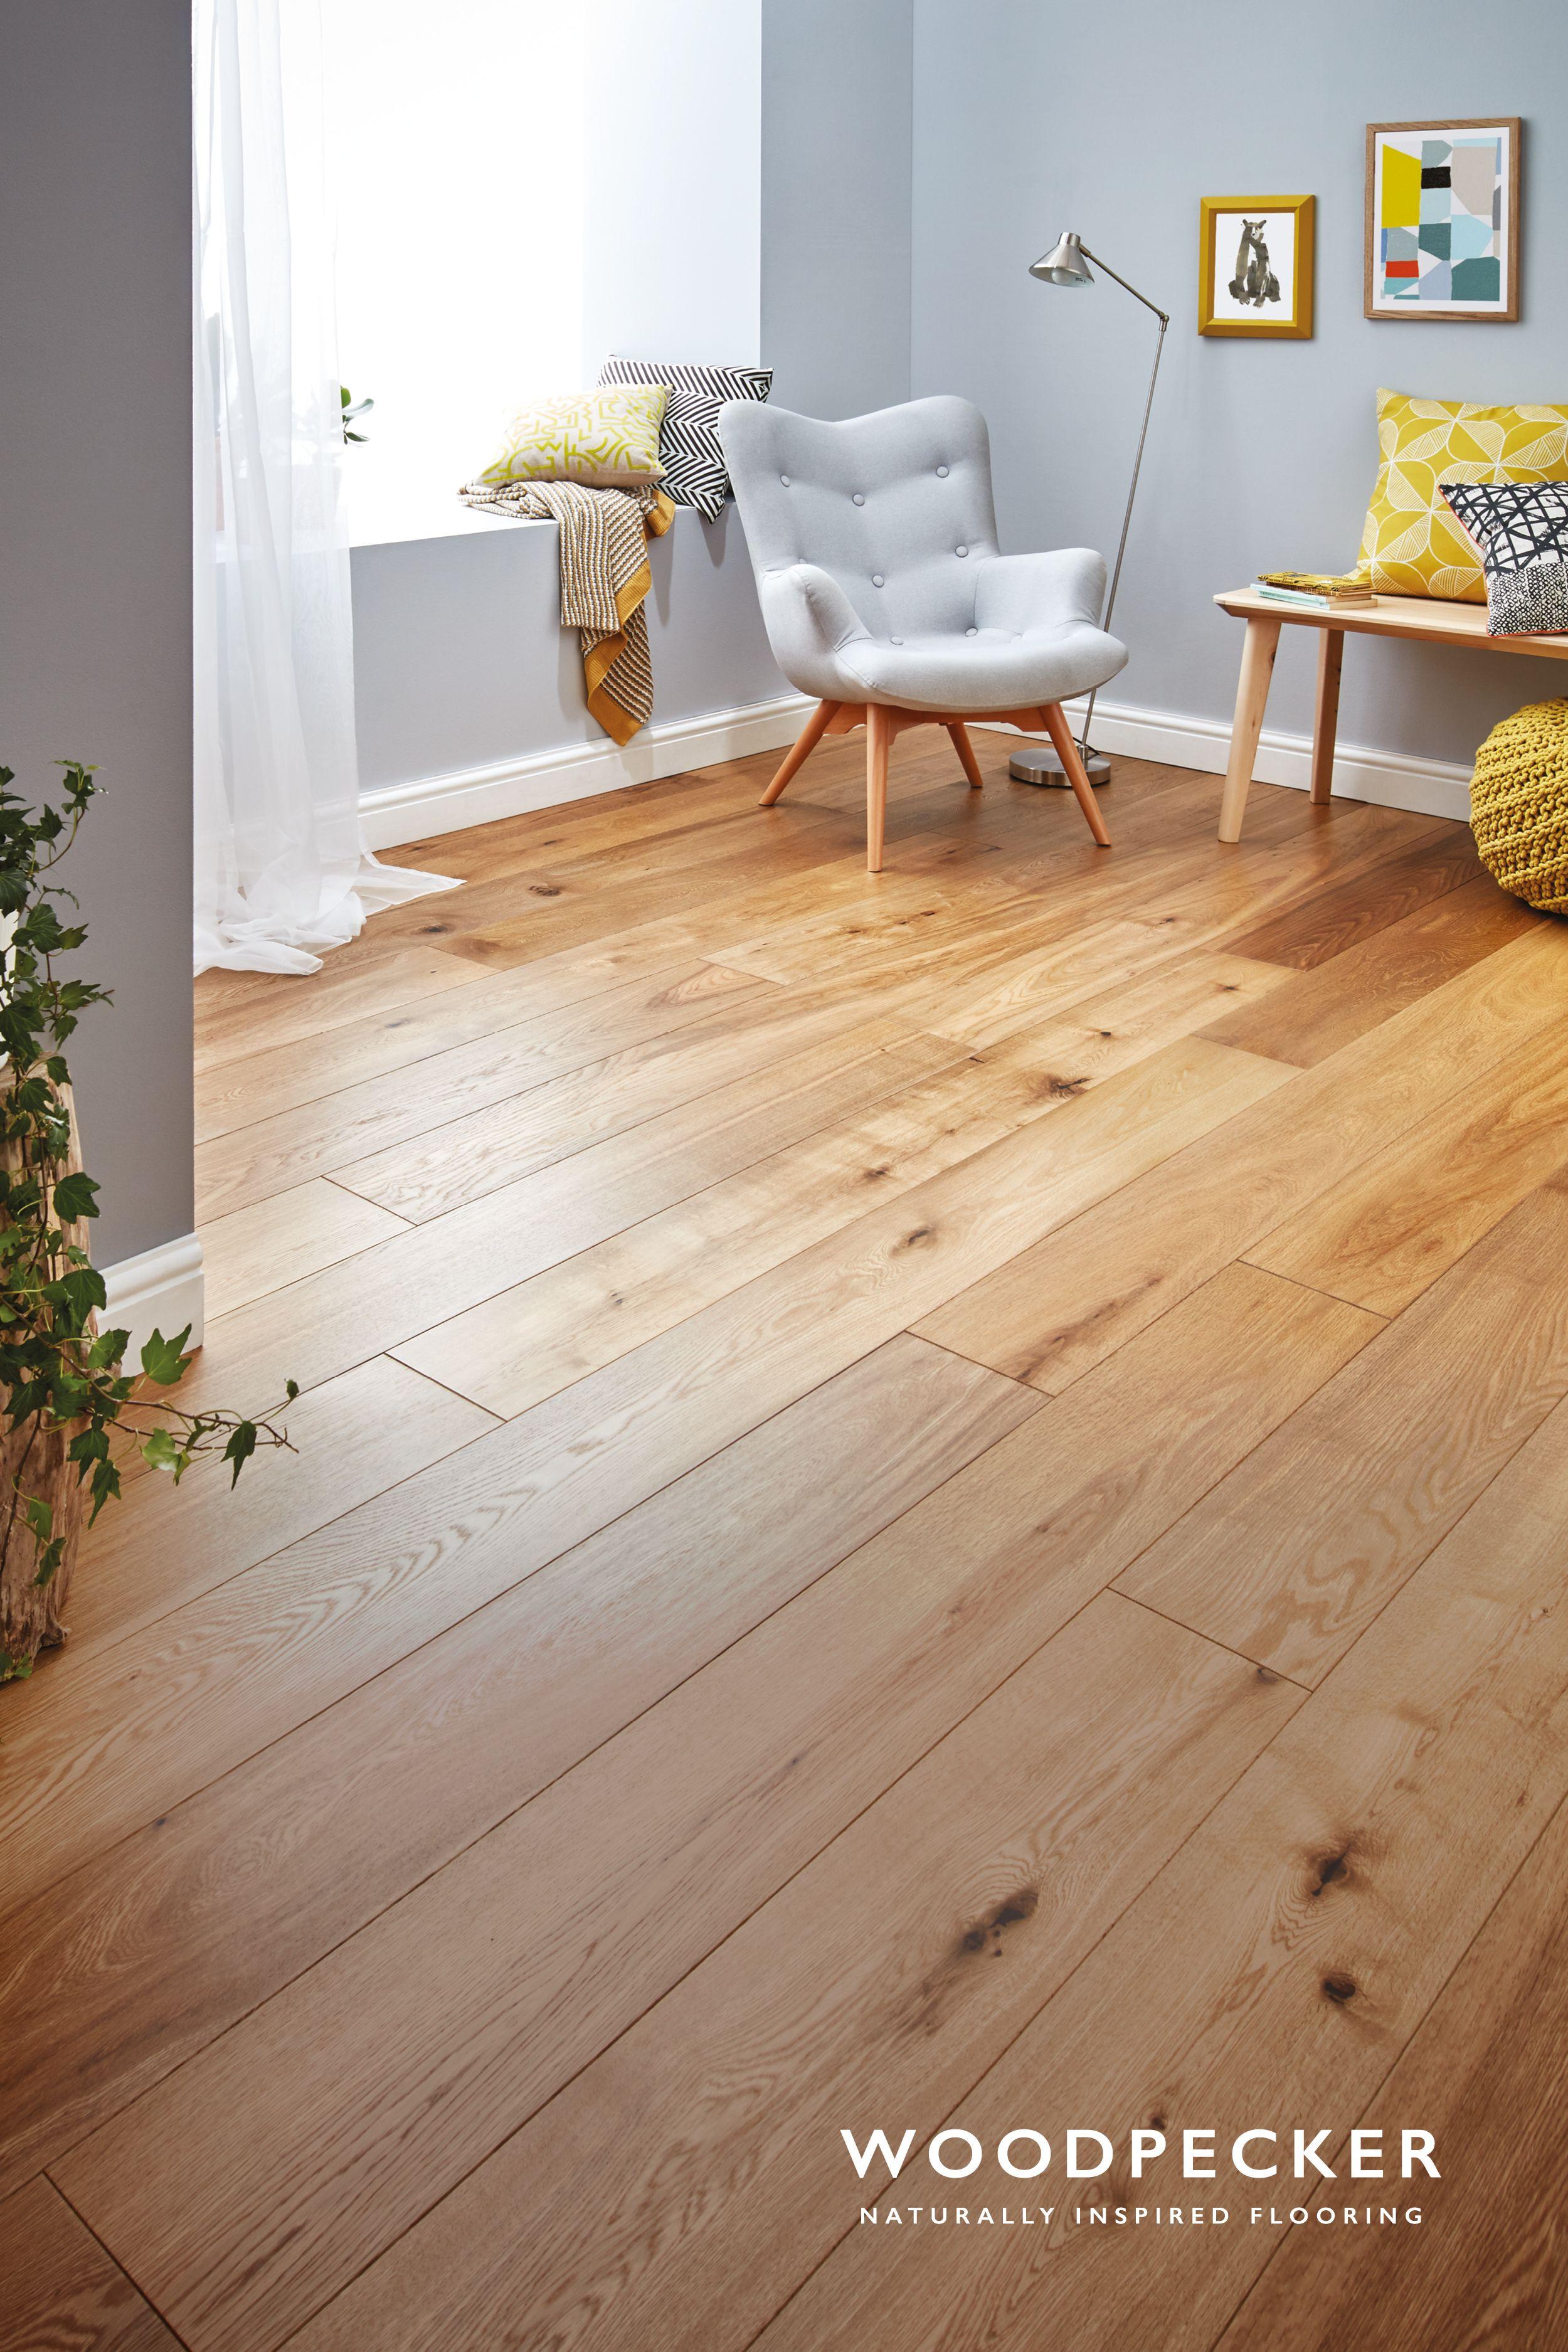 Oak Wood Floor Living Room Feng Shui Color Harlech Smoked Home Decor That I Love Pinterest Flooring C3234da9660c98f0e2f302f213ea8869 Jpg